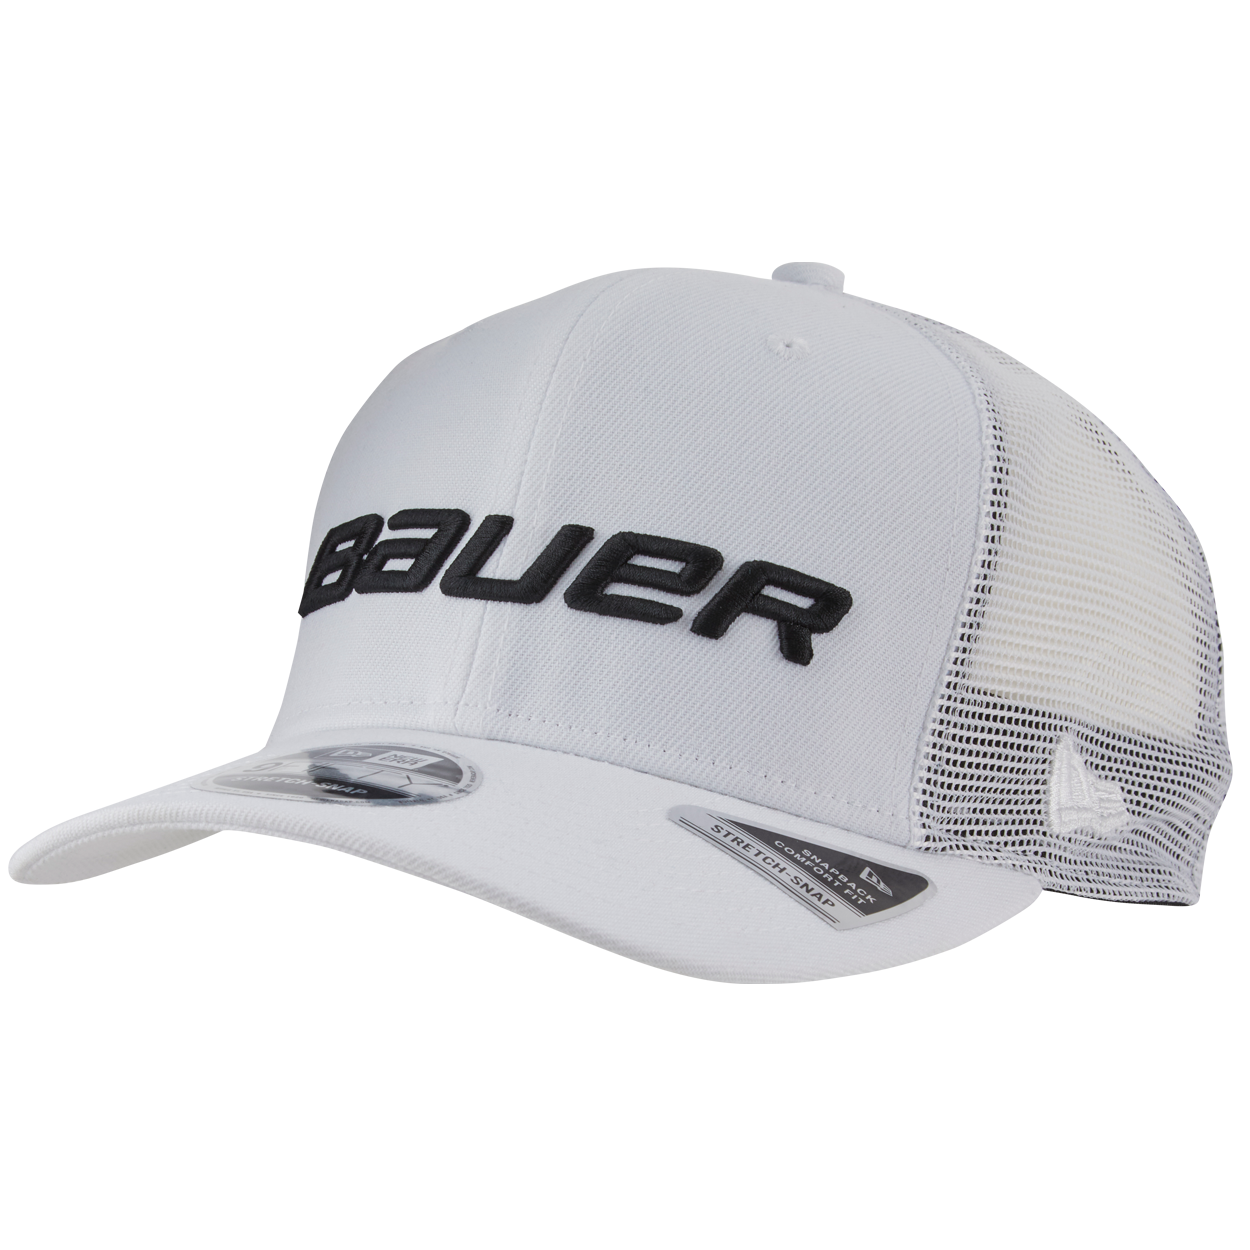 VAPOR New Era 9FIFTY Snapback Hat